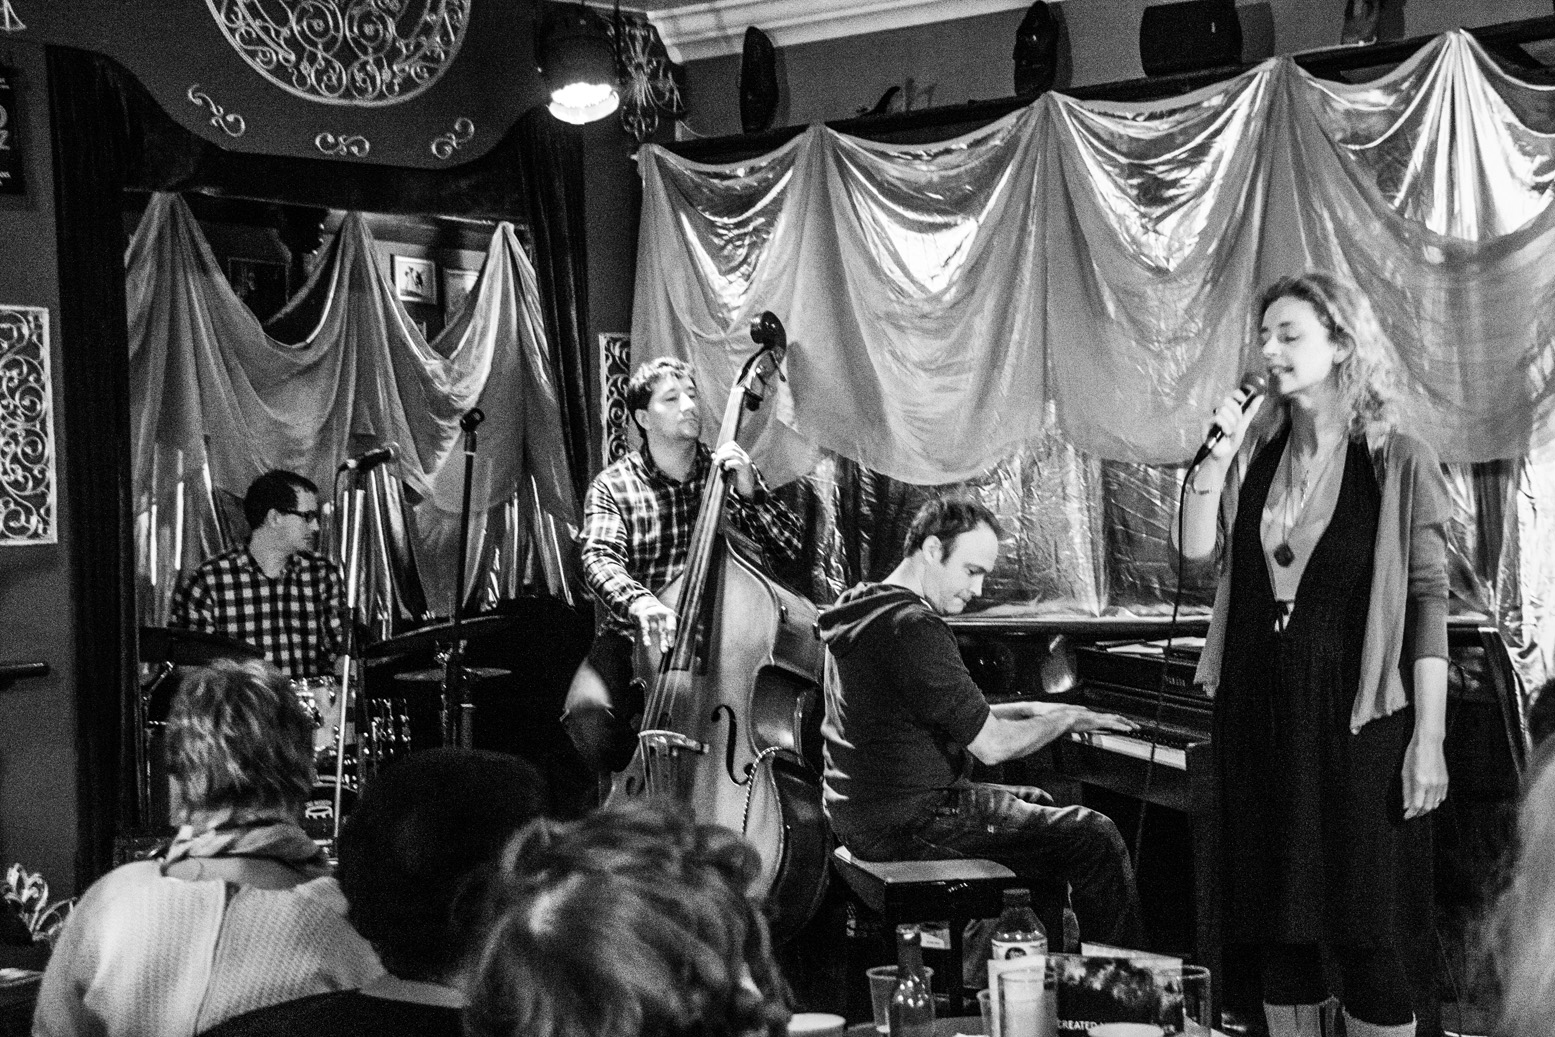 Singers corner, cork jazz festival 2013